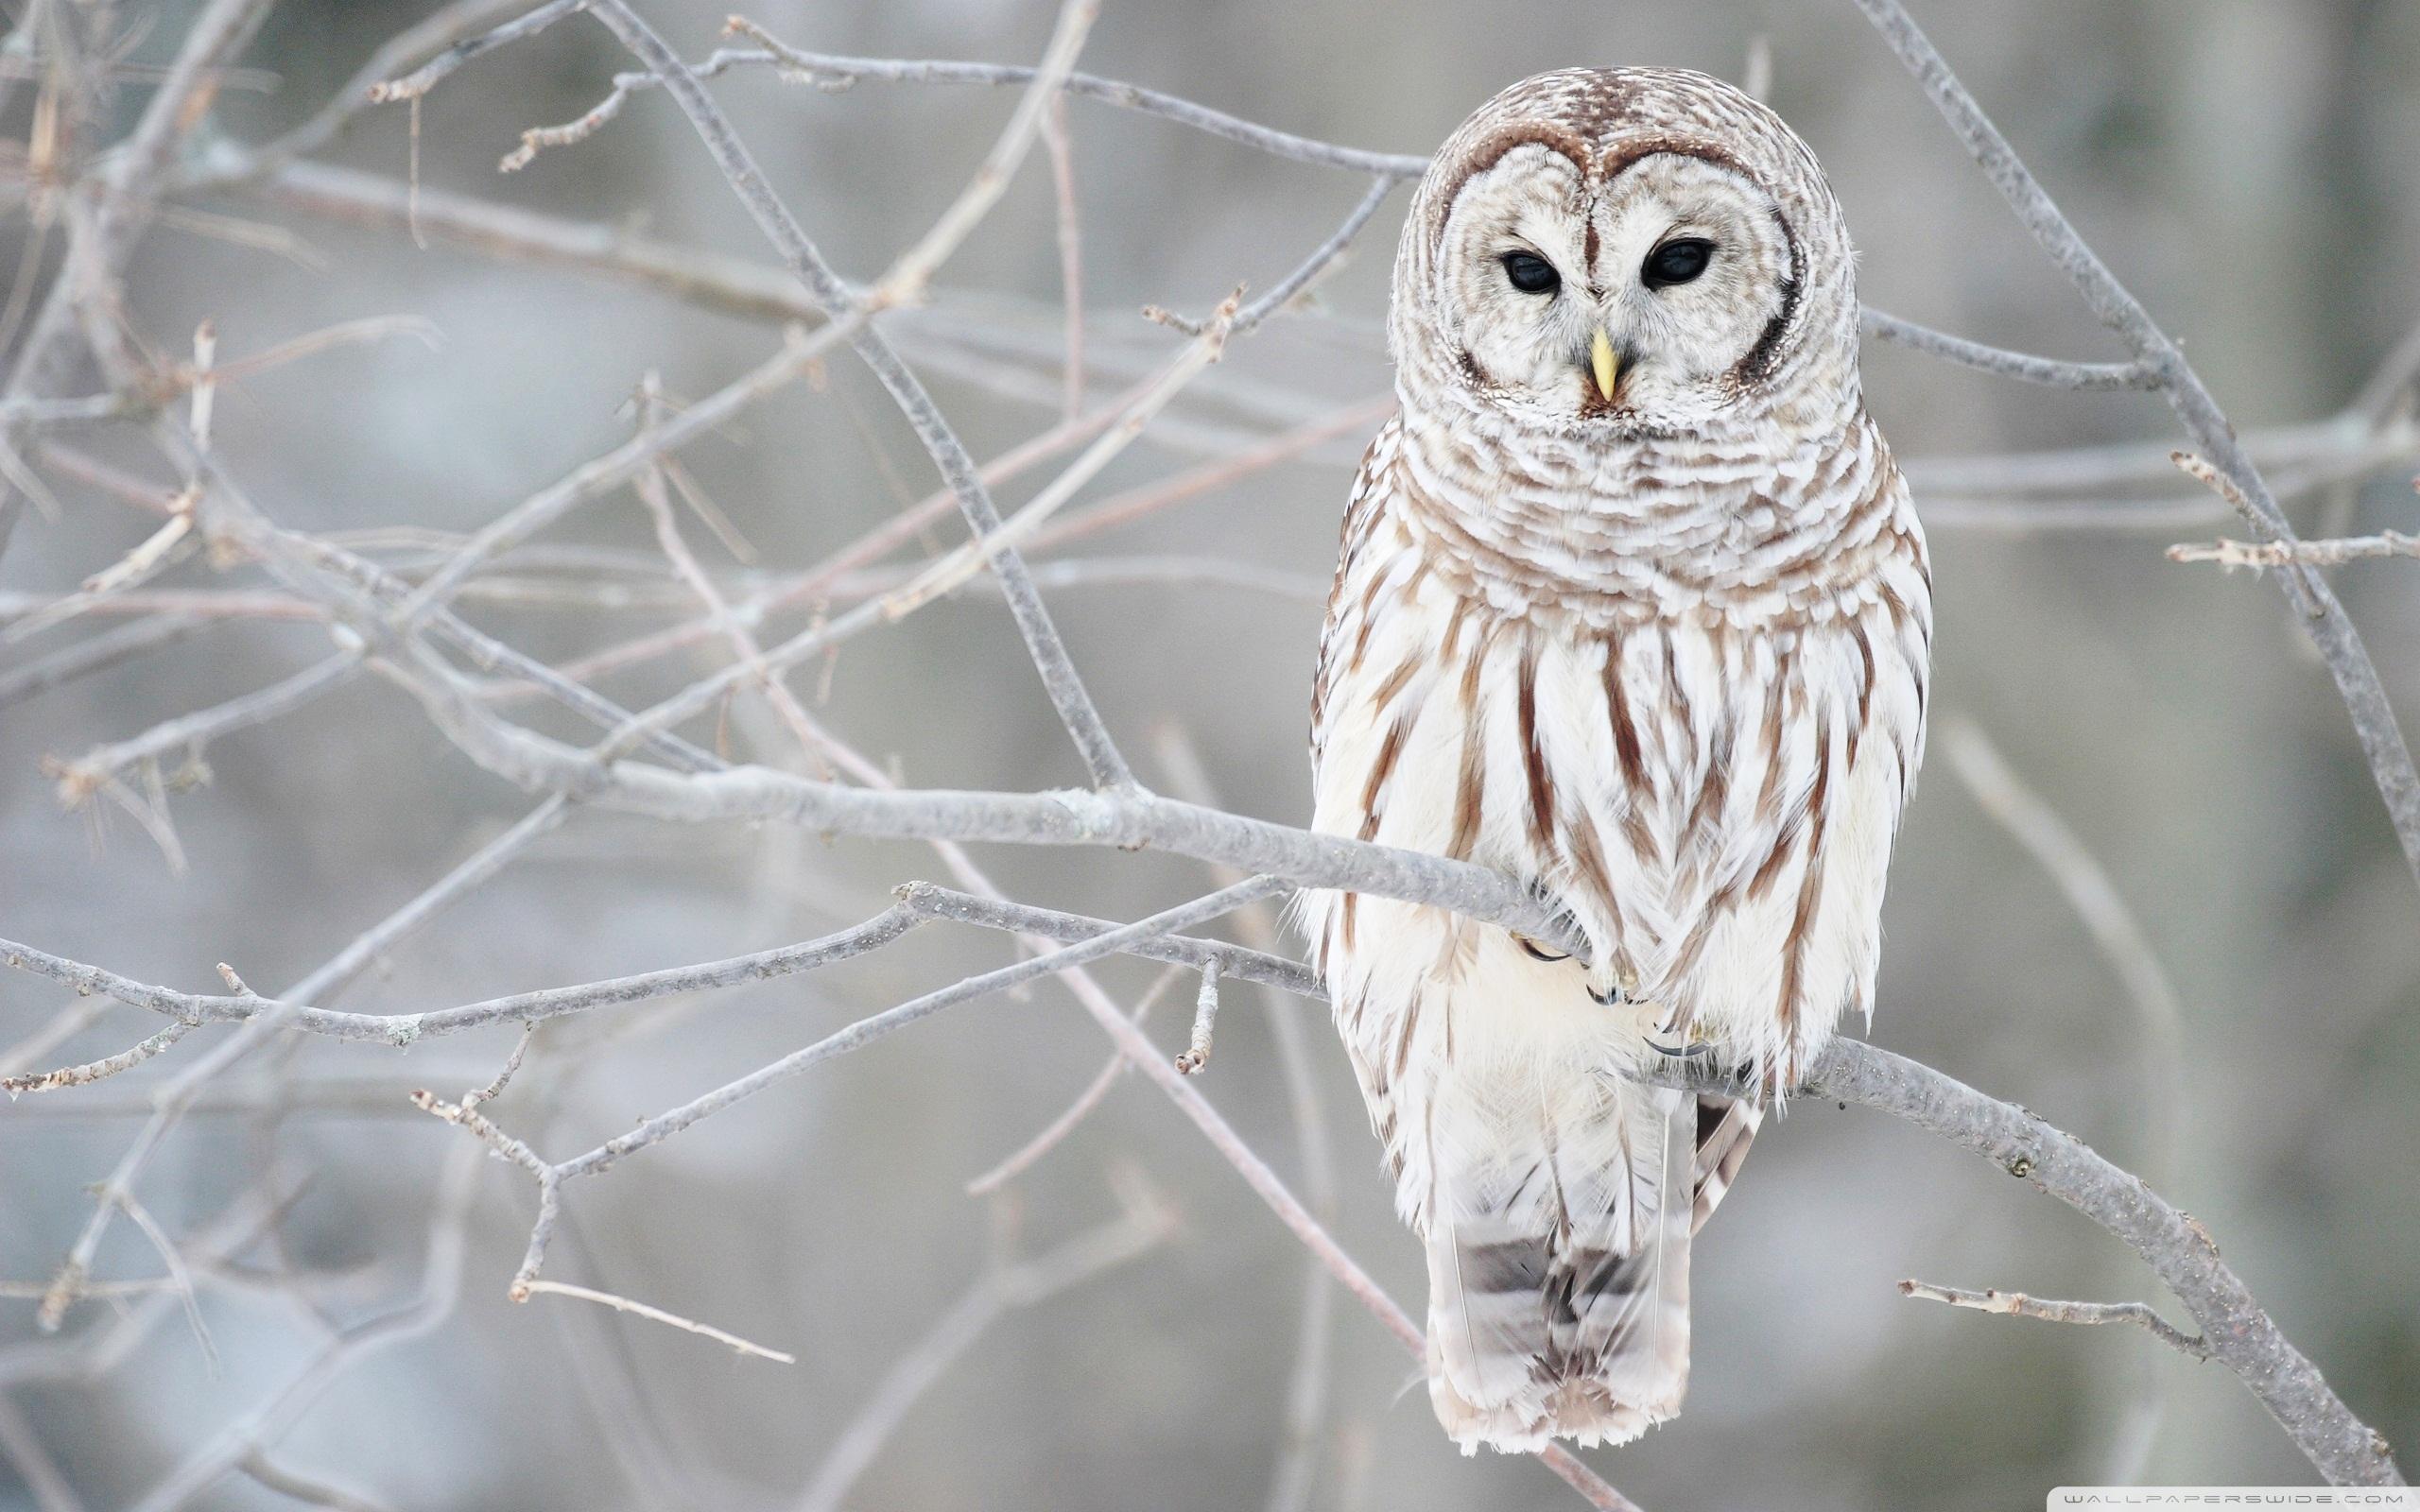 41 Snowy Owl Wallpaper Hd On Wallpapersafari